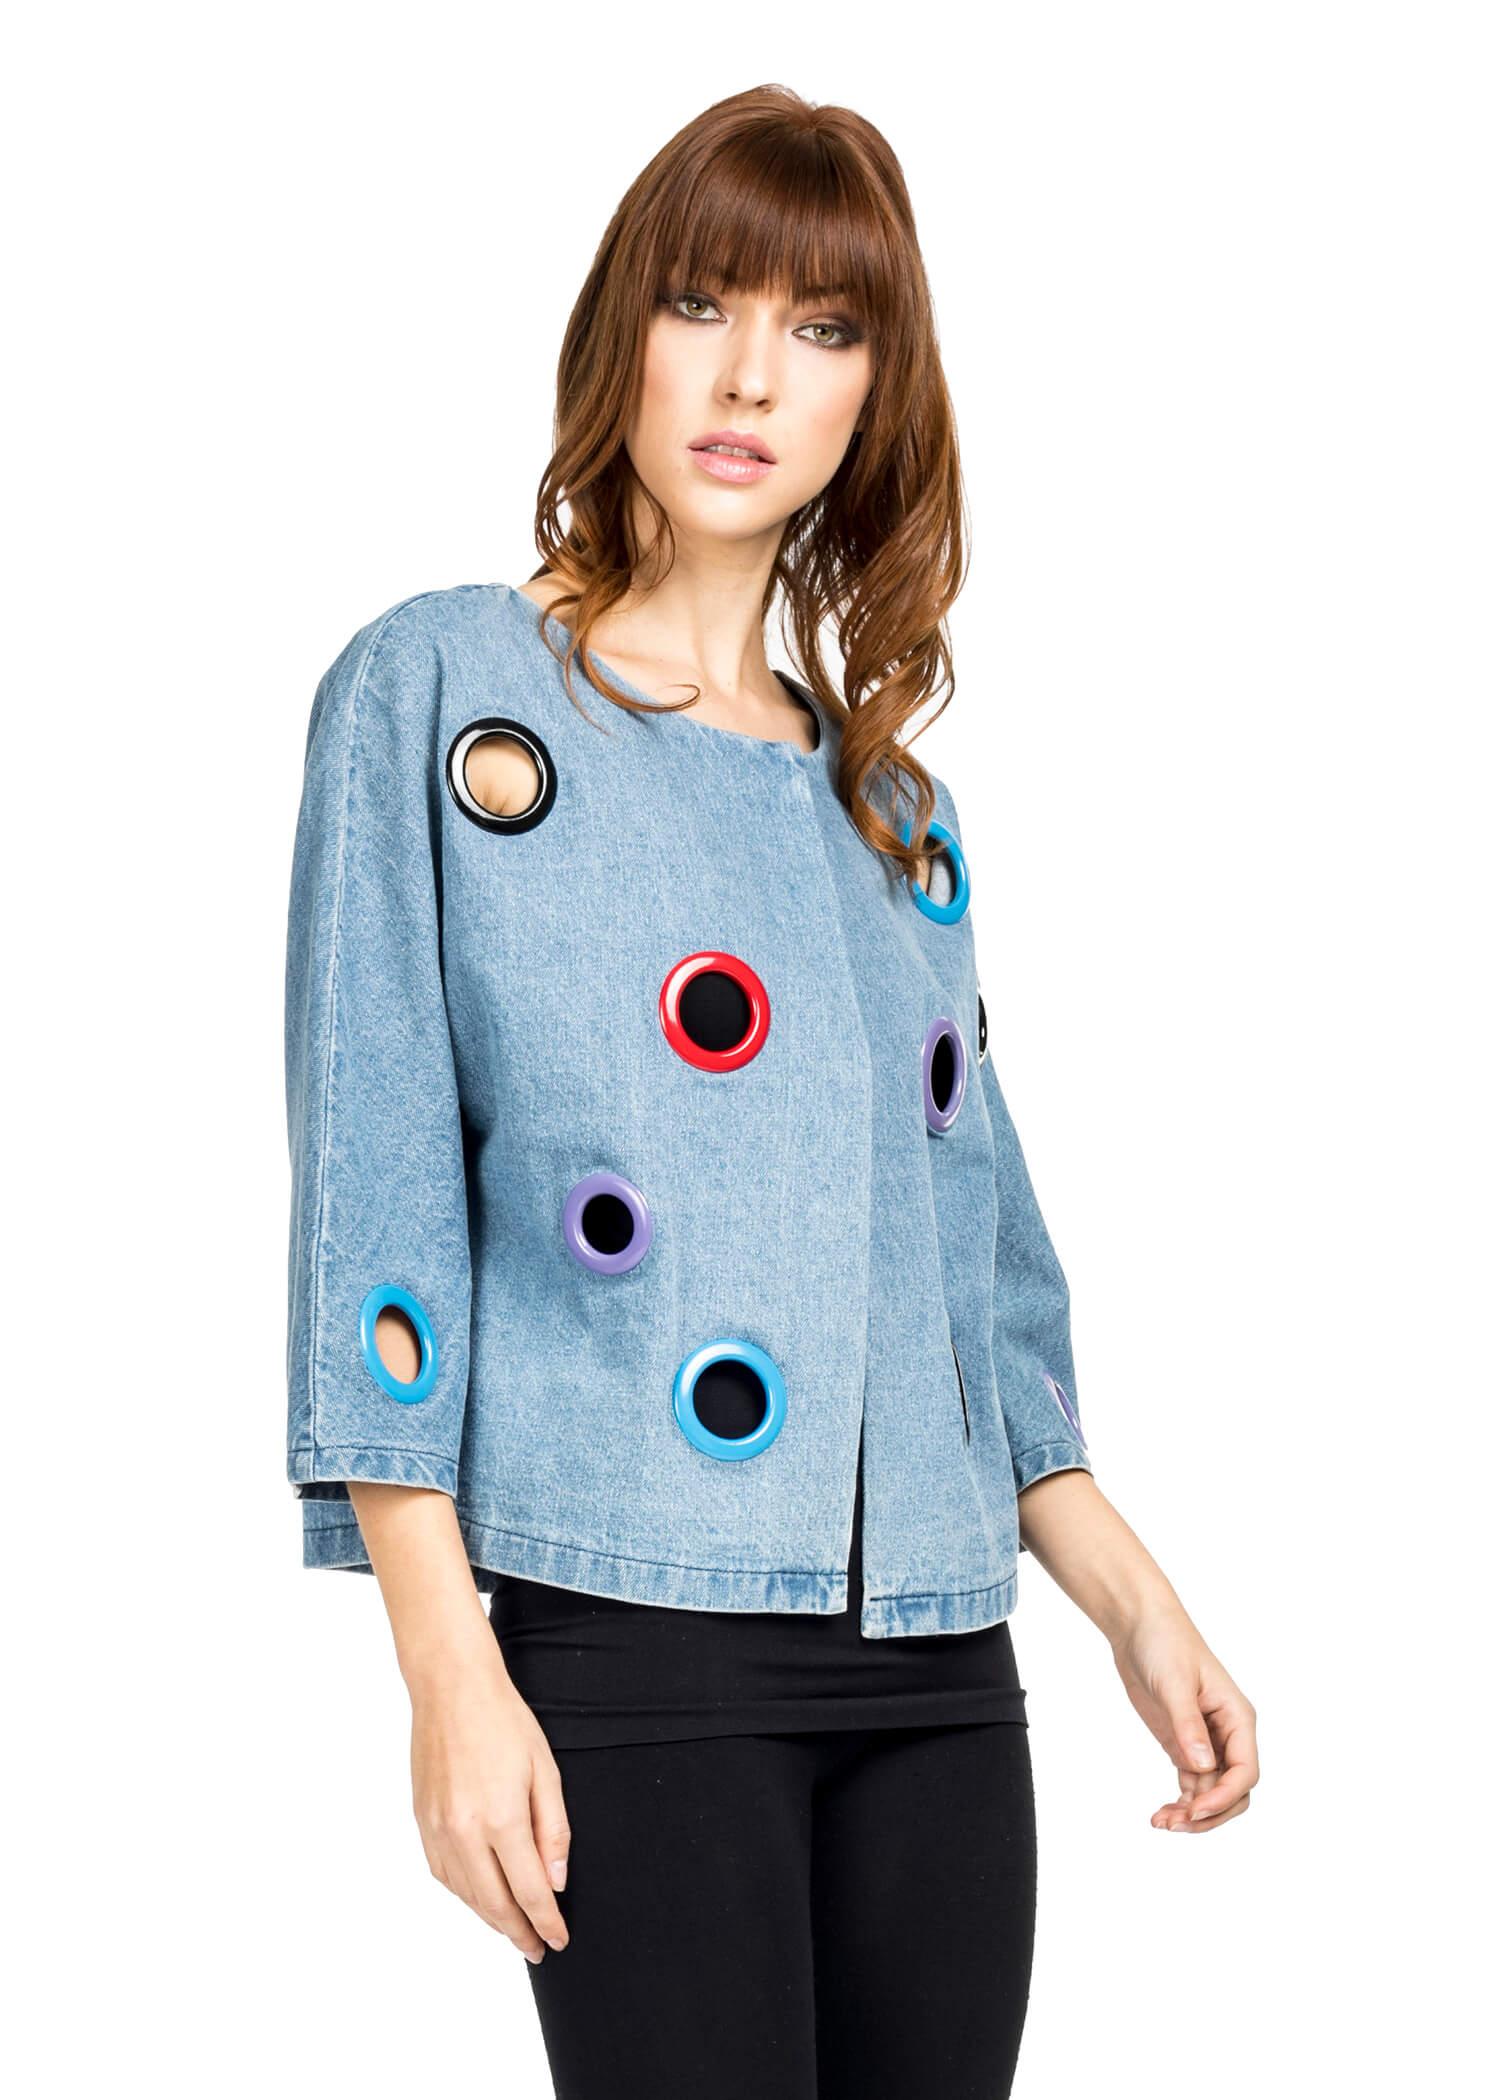 circle jean jacket